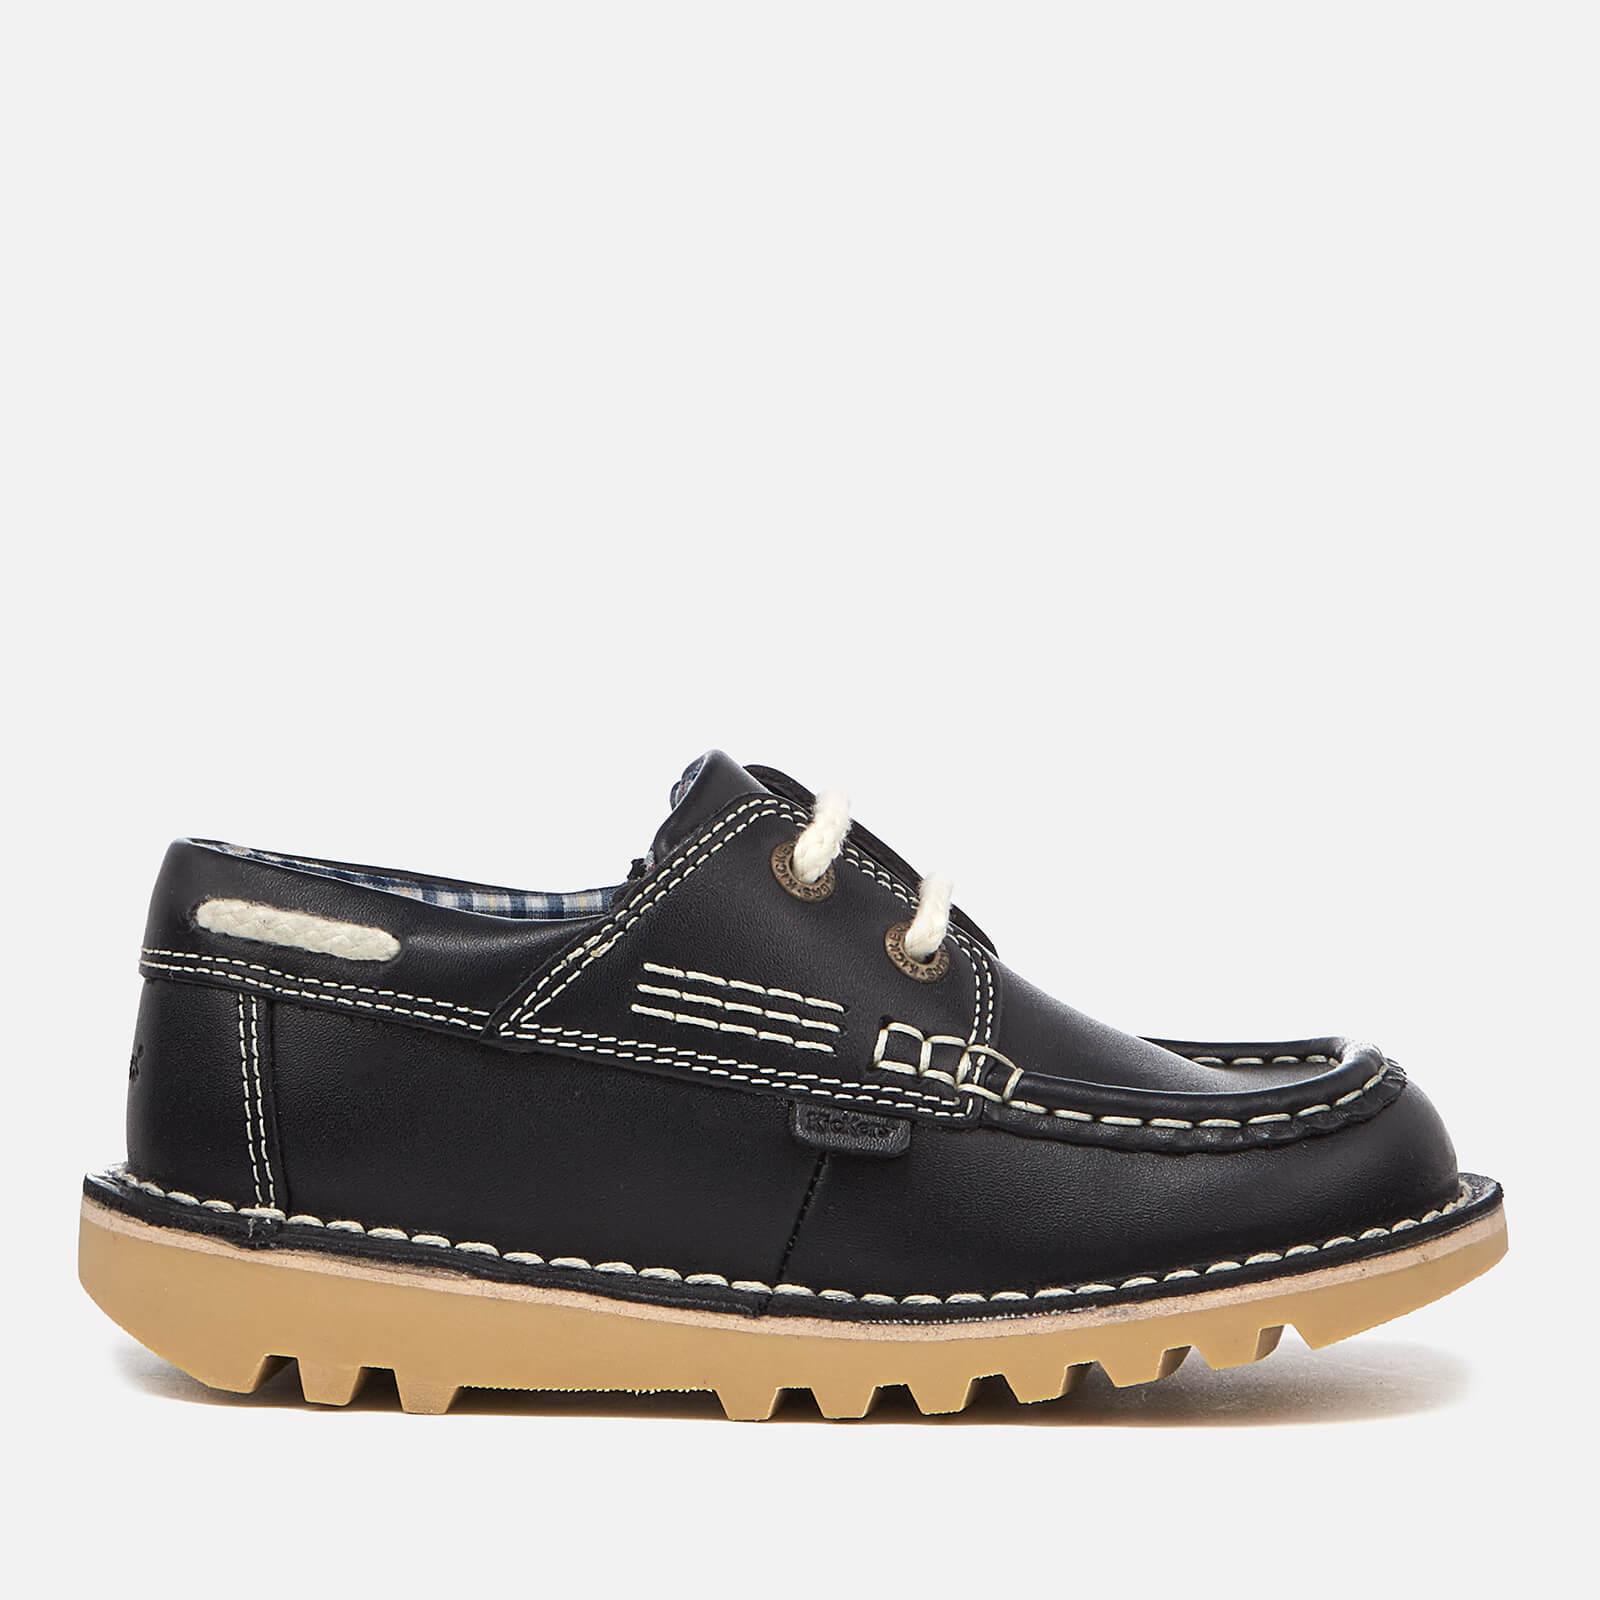 Kickers Kids' Kick Boatee Shoes - Navy £8.99 + £1.99 delivery at Zavvi